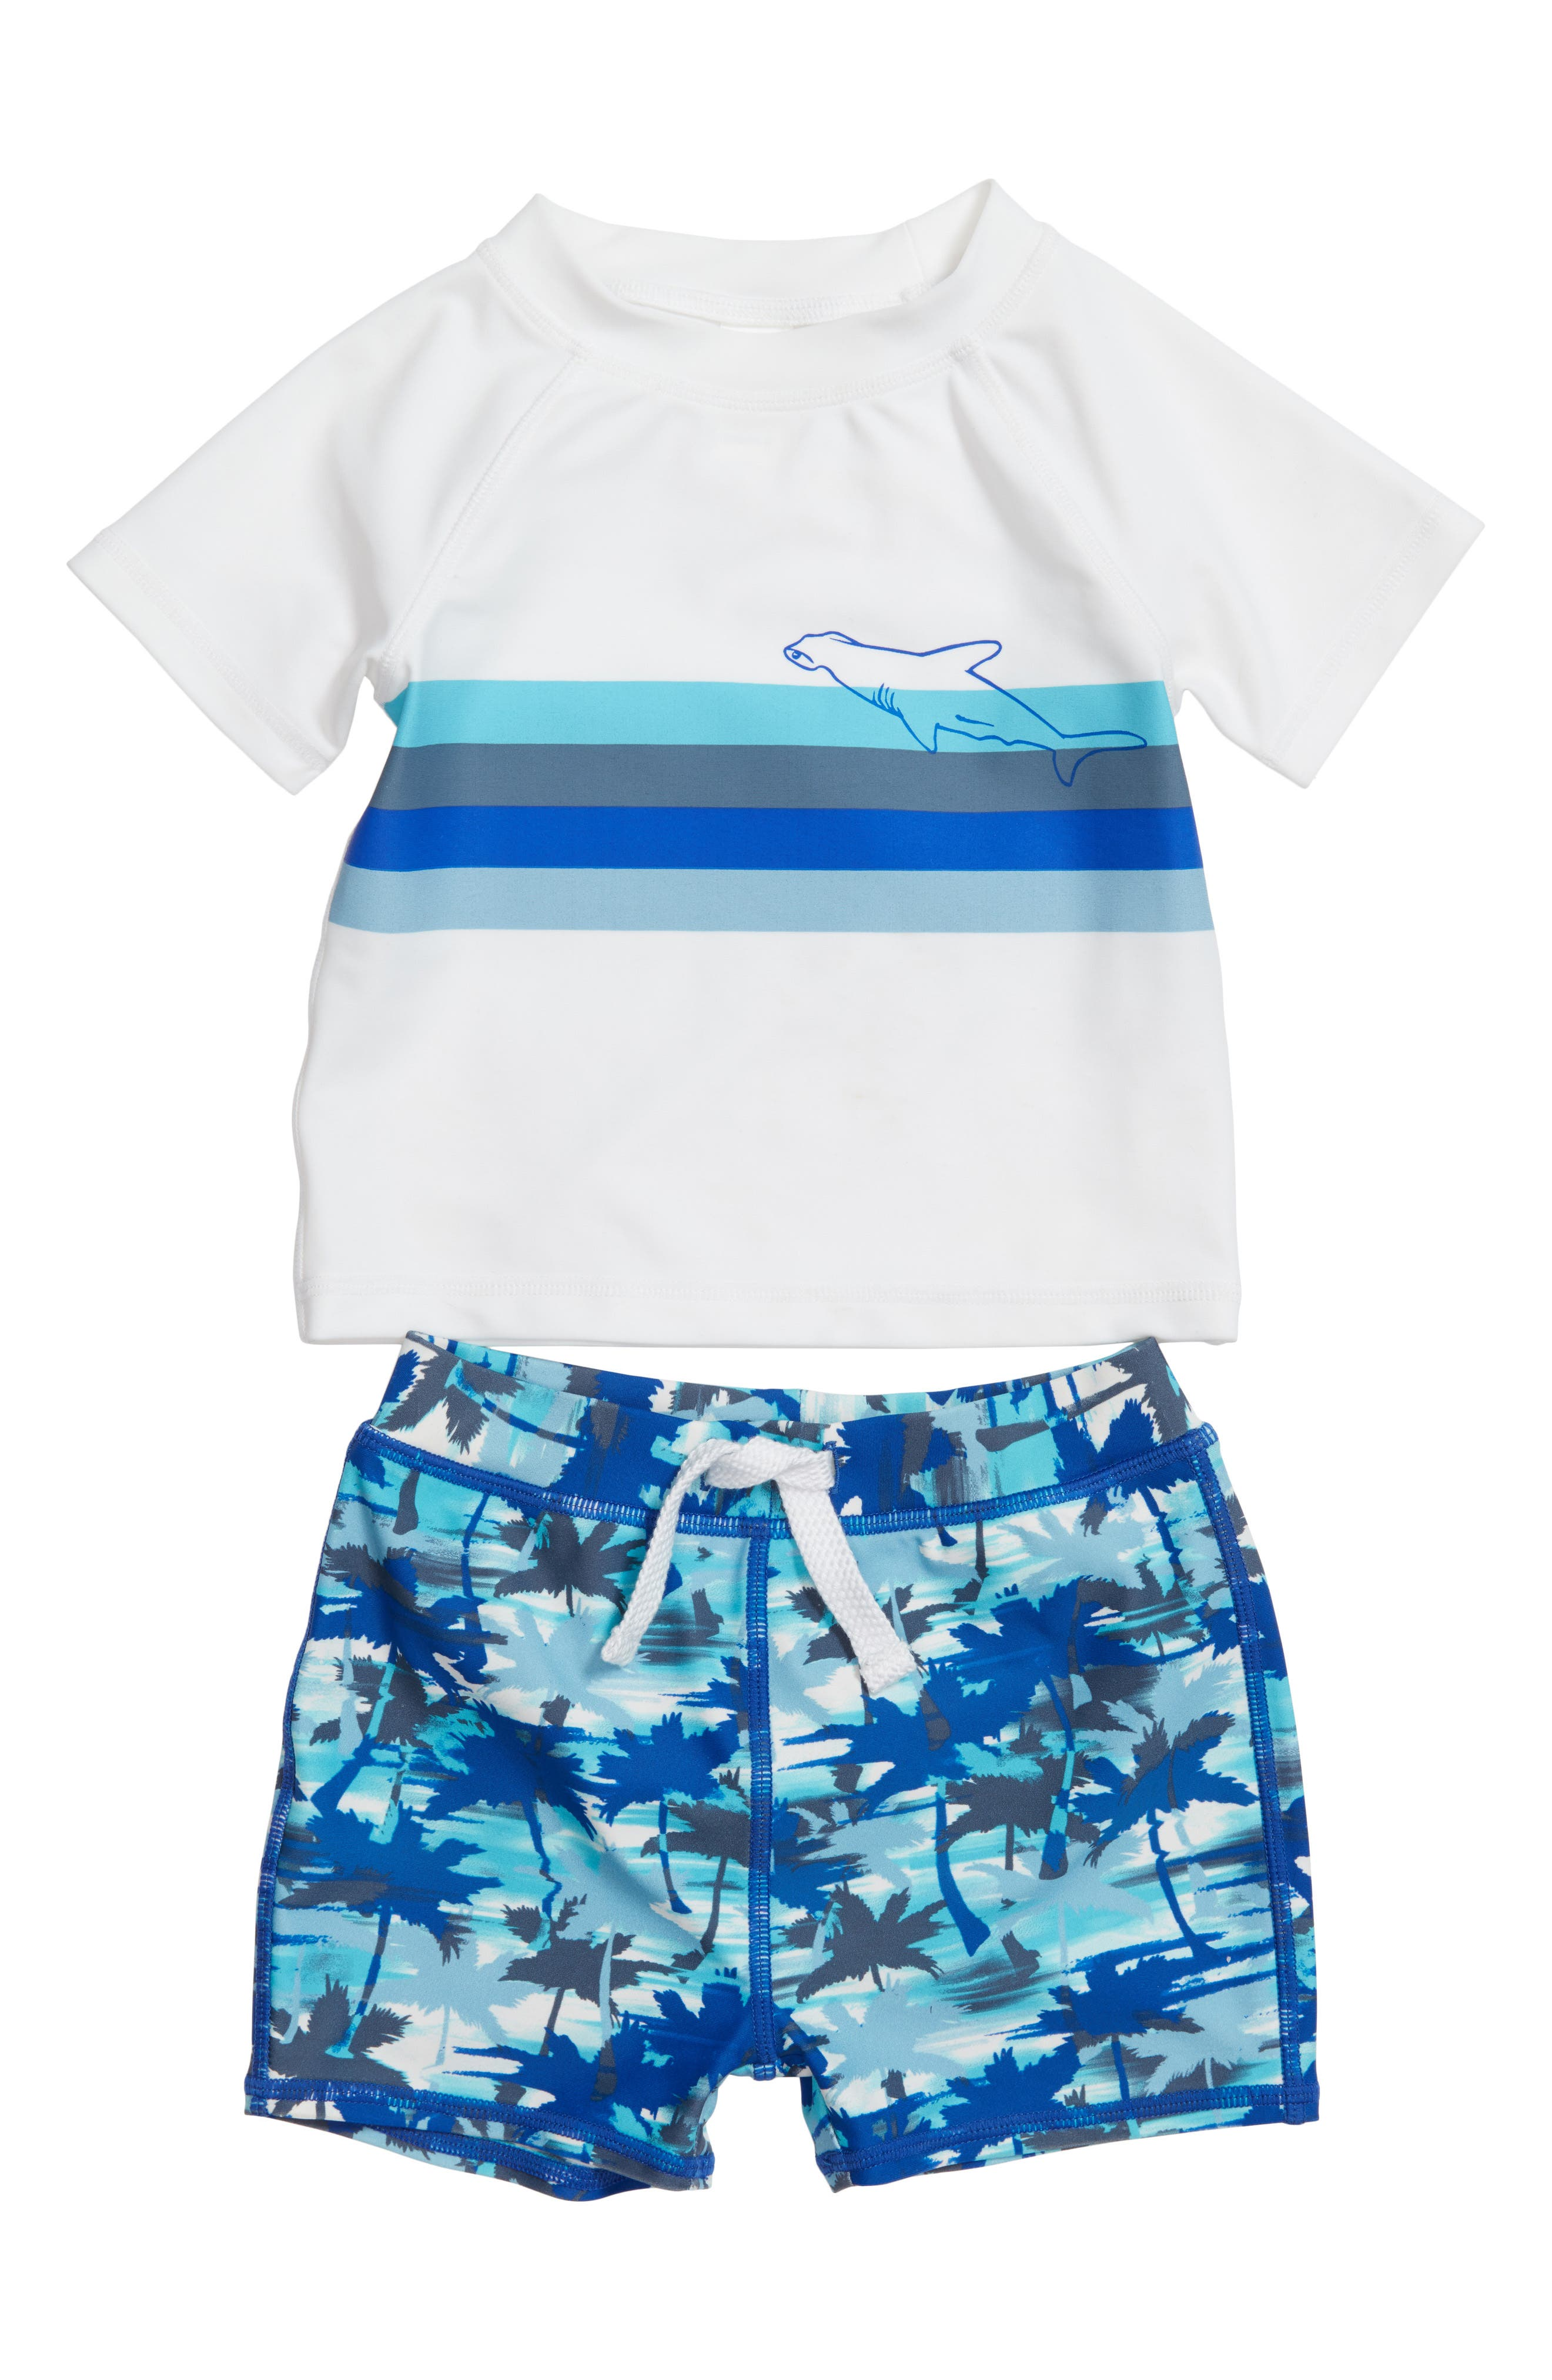 Tucker + Tate Two-Piece Rashguard Swimsuit (Baby Boys)